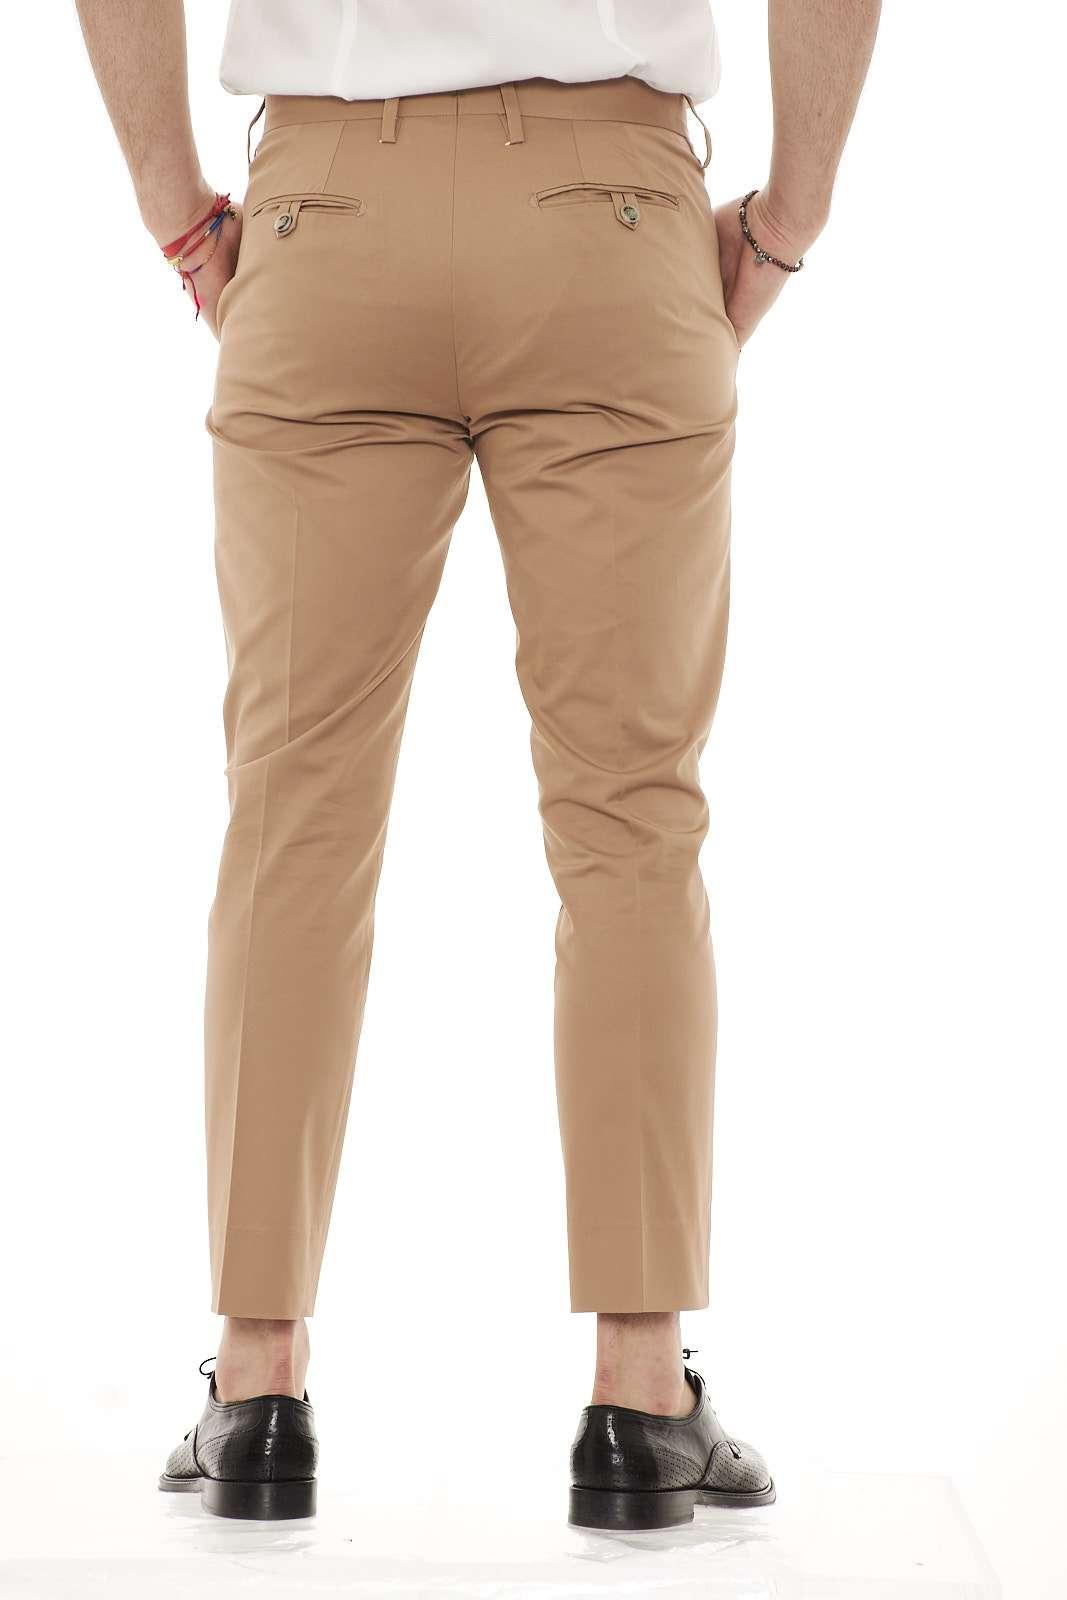 PE-outlet_parmax-pantaloni-uomo-Entre-Amis-p188355